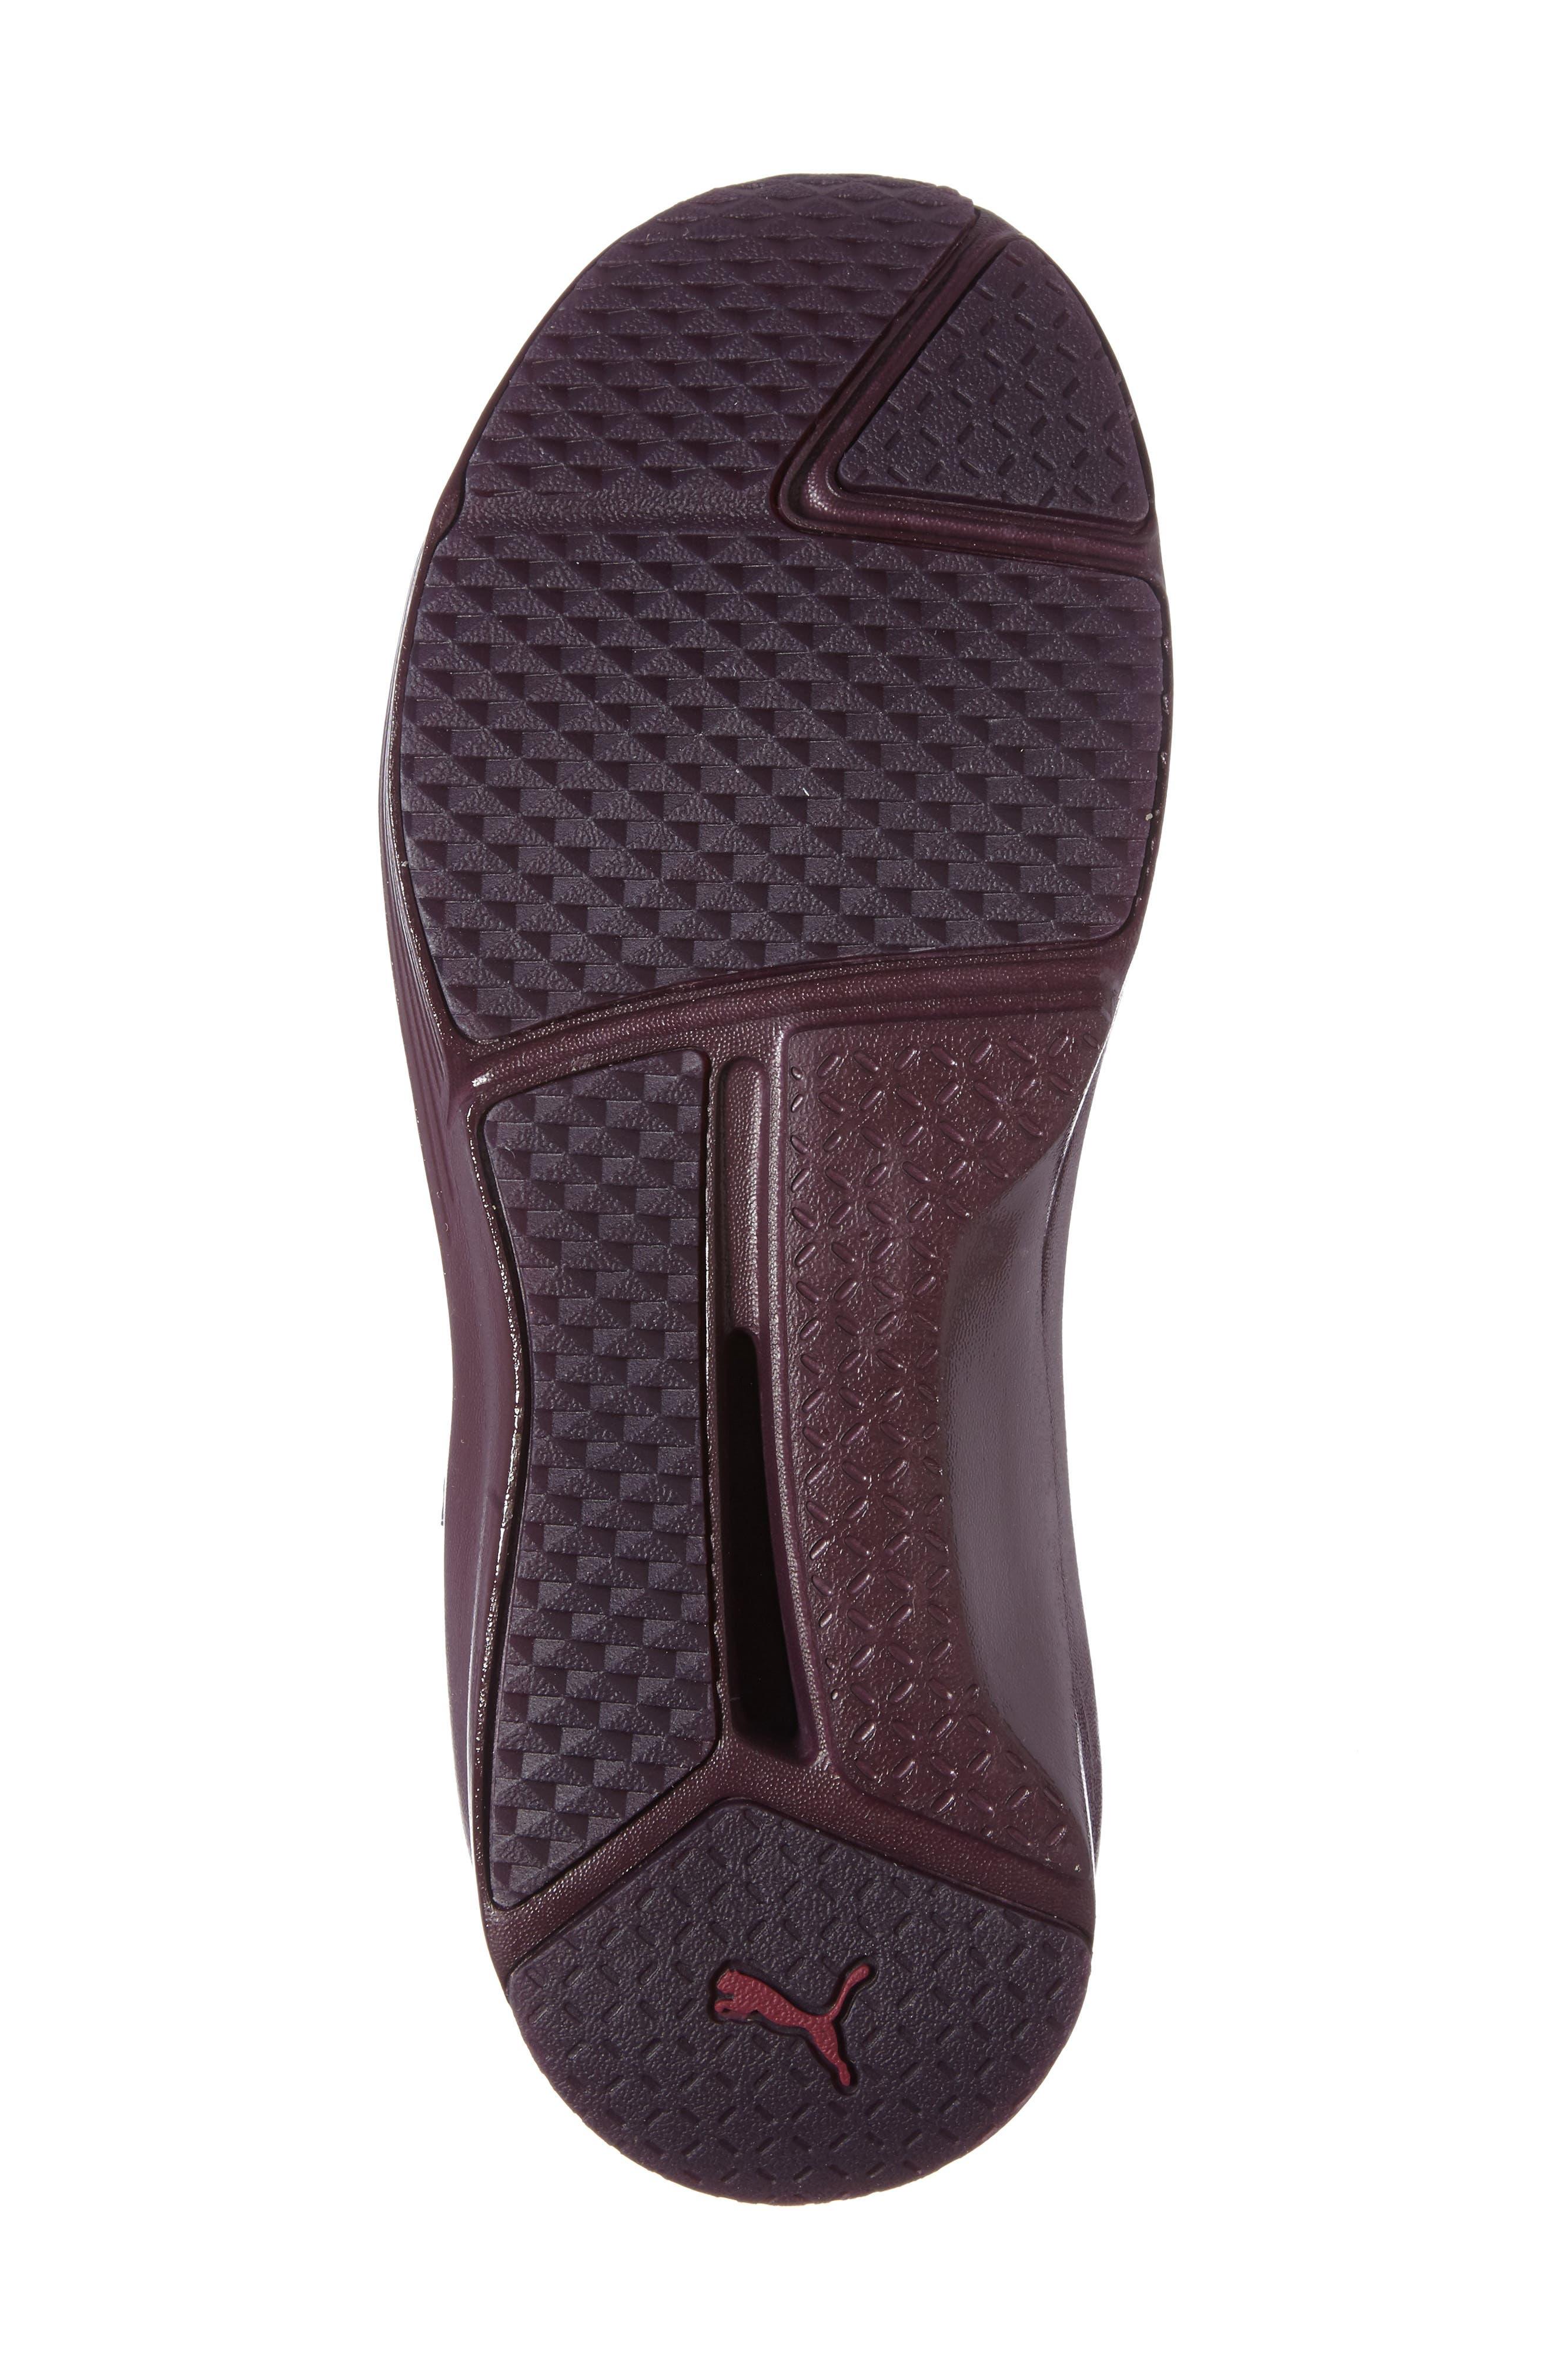 Fierce KRM High Top Sneaker,                             Alternate thumbnail 4, color,                             Red Plum